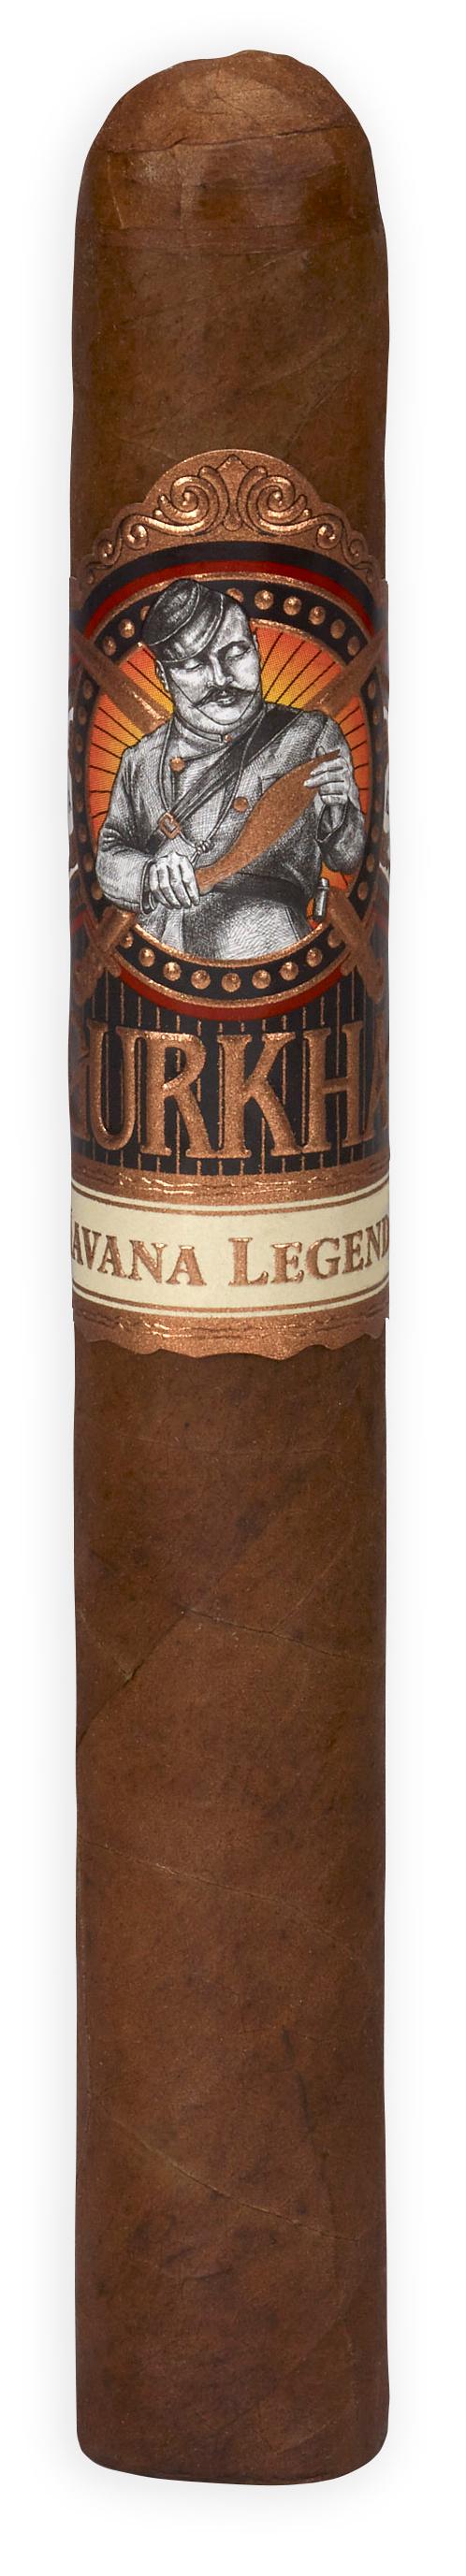 Gurkha Cigars Havana Legend